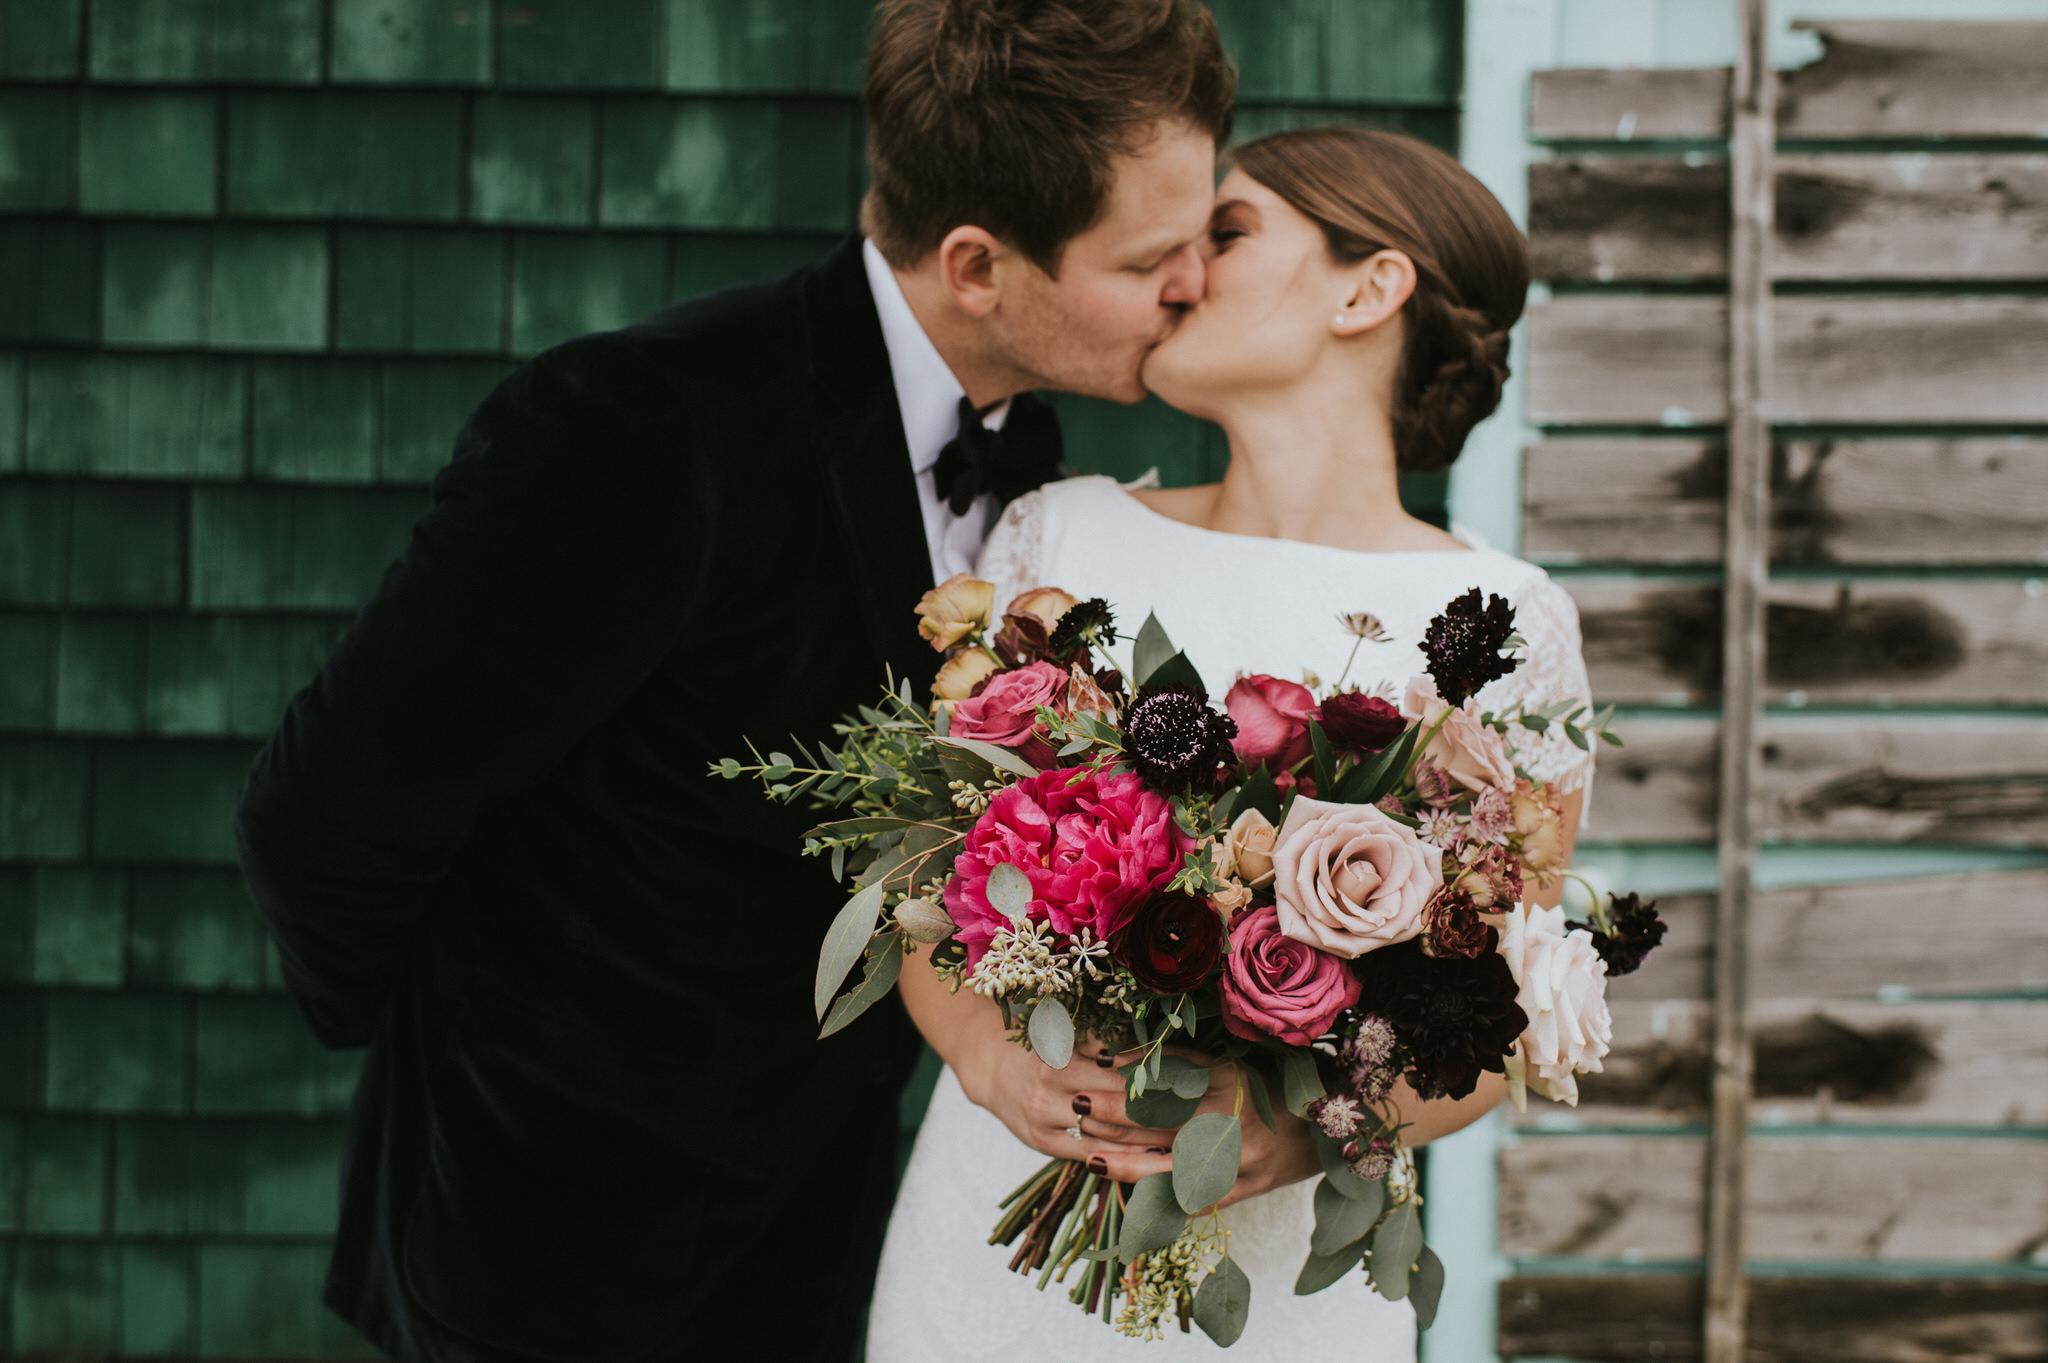 scarletoneillphotography_weddingphotography_prince edward county weddings065.JPG